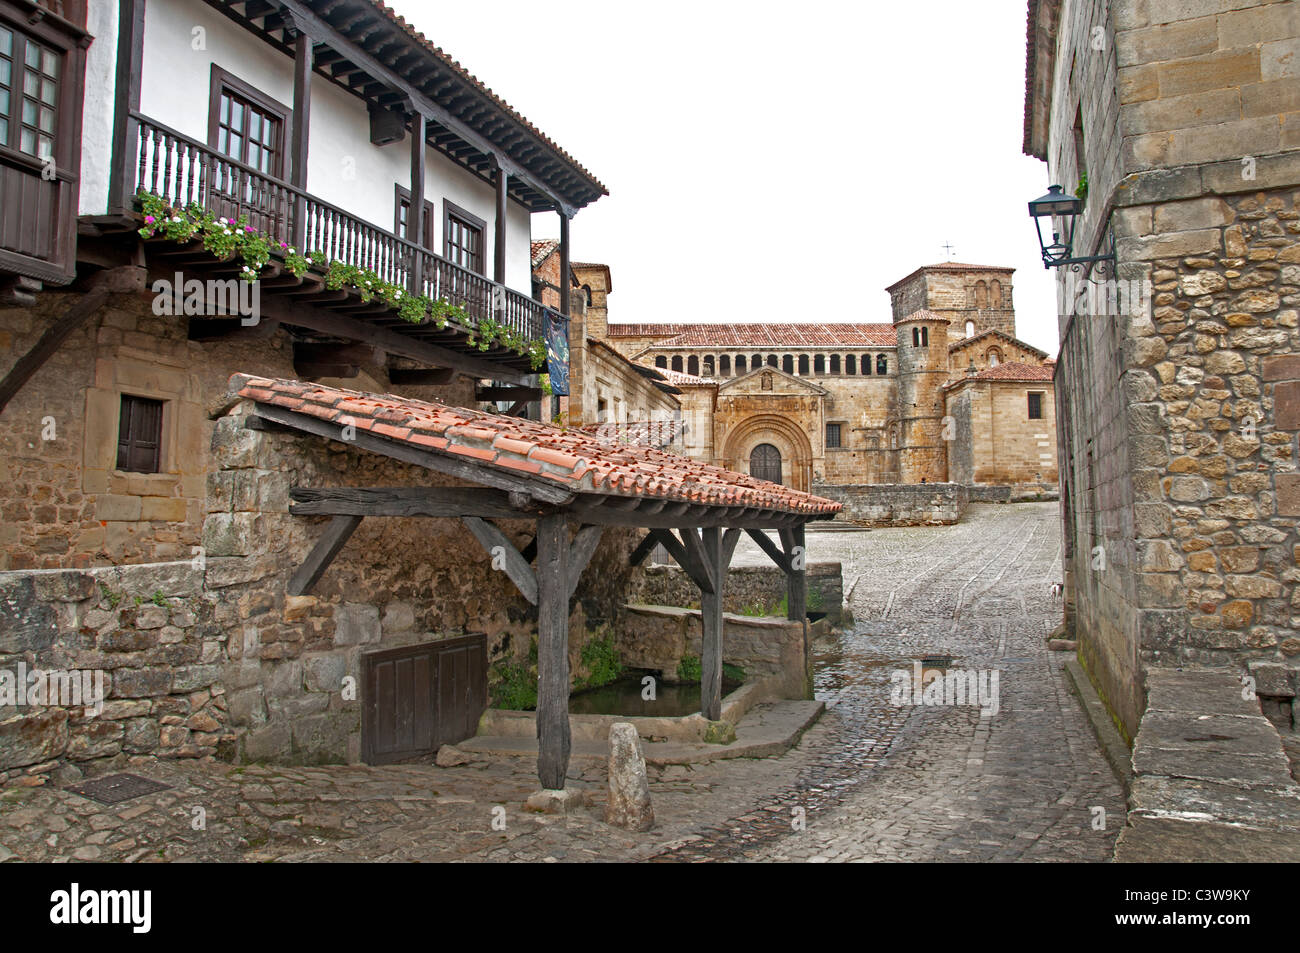 Santillana del Mar Cantabria Spain Spanish town - Stock Image